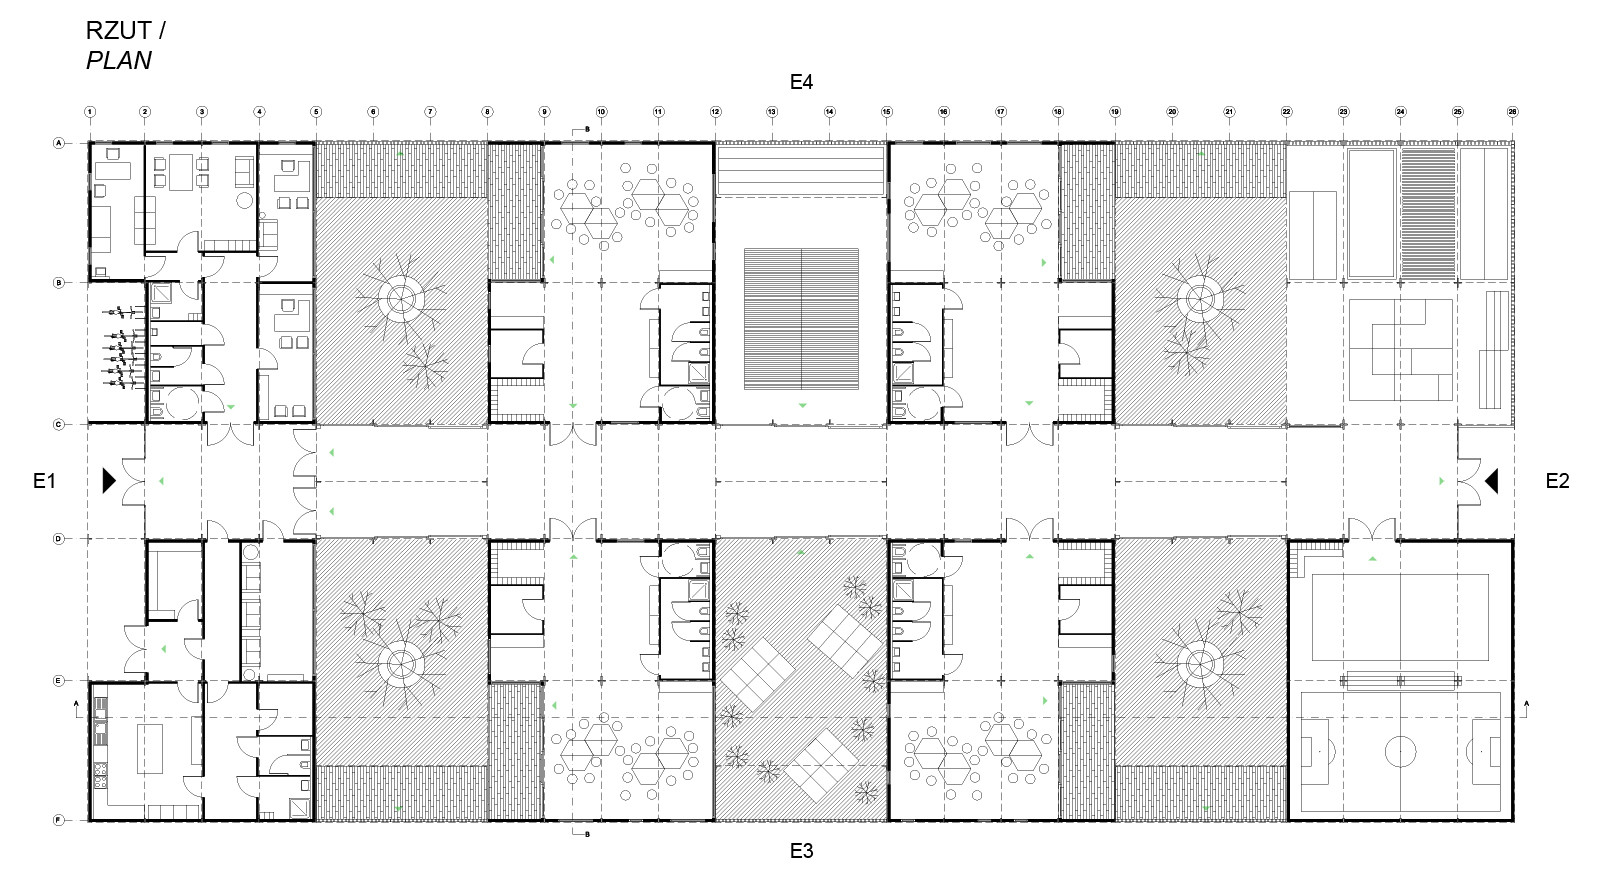 Master Bathroom Color Ideas Gallery Of Kids City Modular Kindergarten Proposal